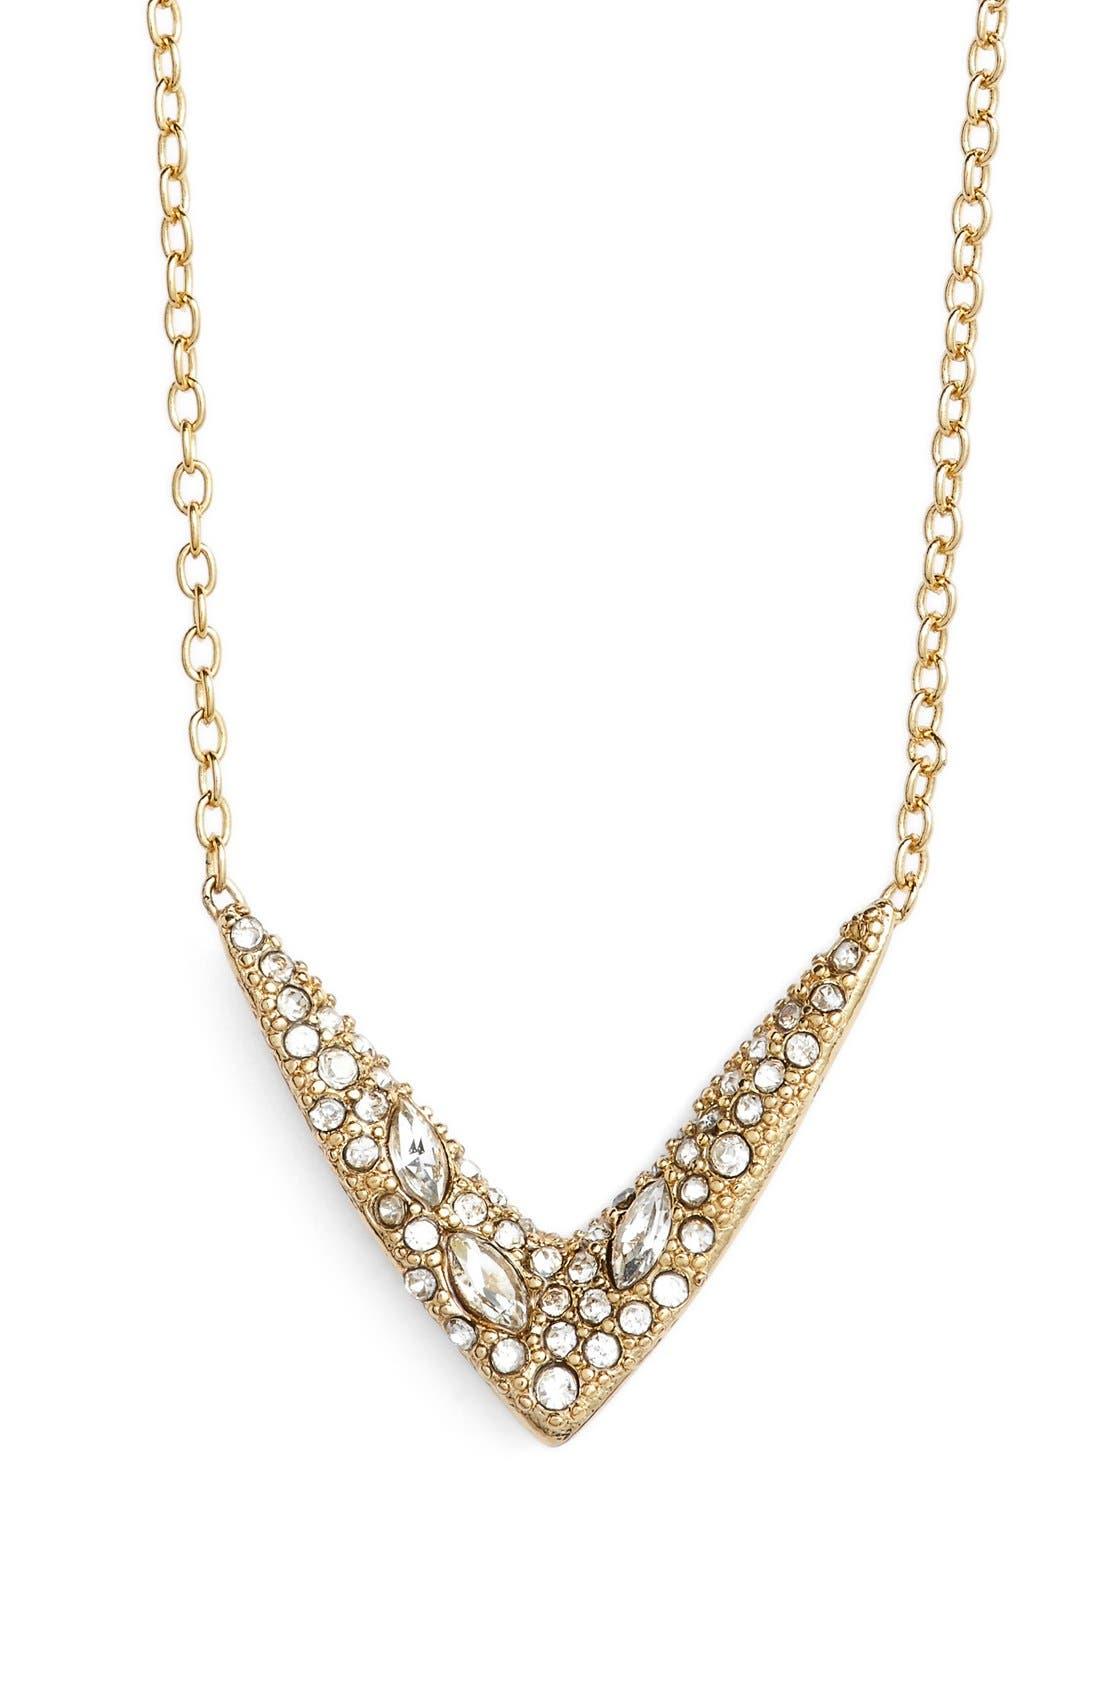 Alternate Image 1 Selected - Alexis Bittar 'Miss Havisham' Encrusted V Pendant Necklace